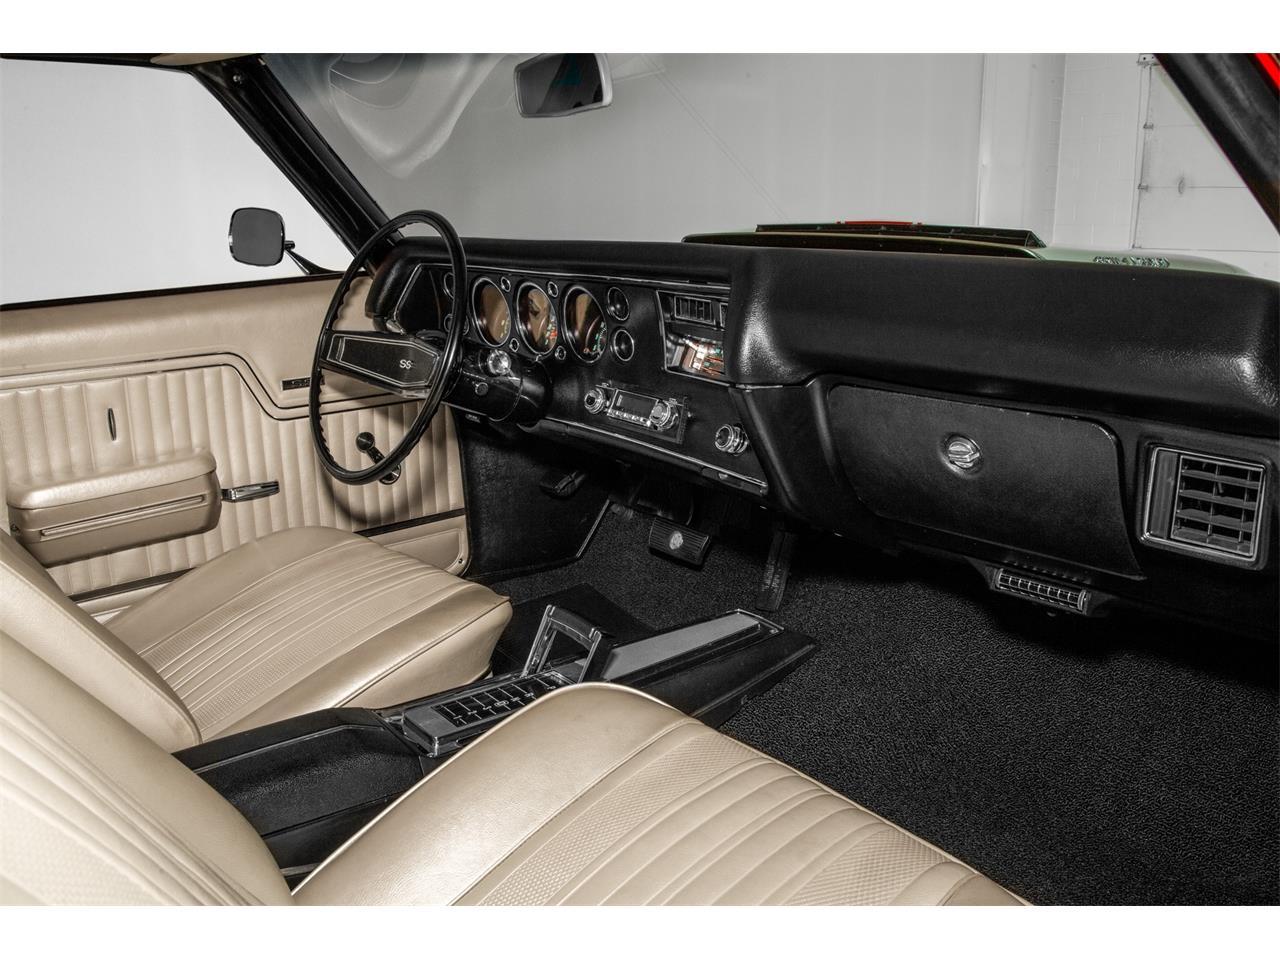 1970 Chevrolet Chevelle (CC-1340352) for sale in Des Moines, Iowa